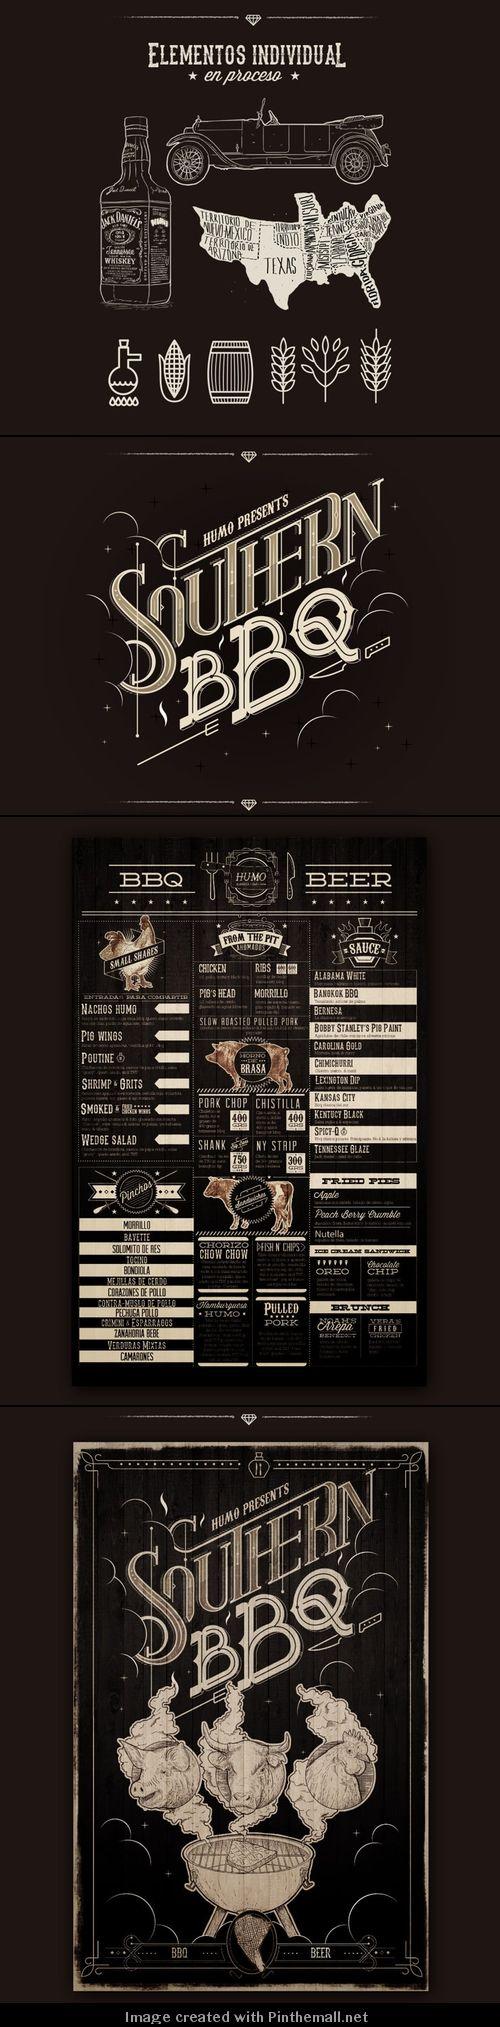 Great design Southern BBQ #brandidentity